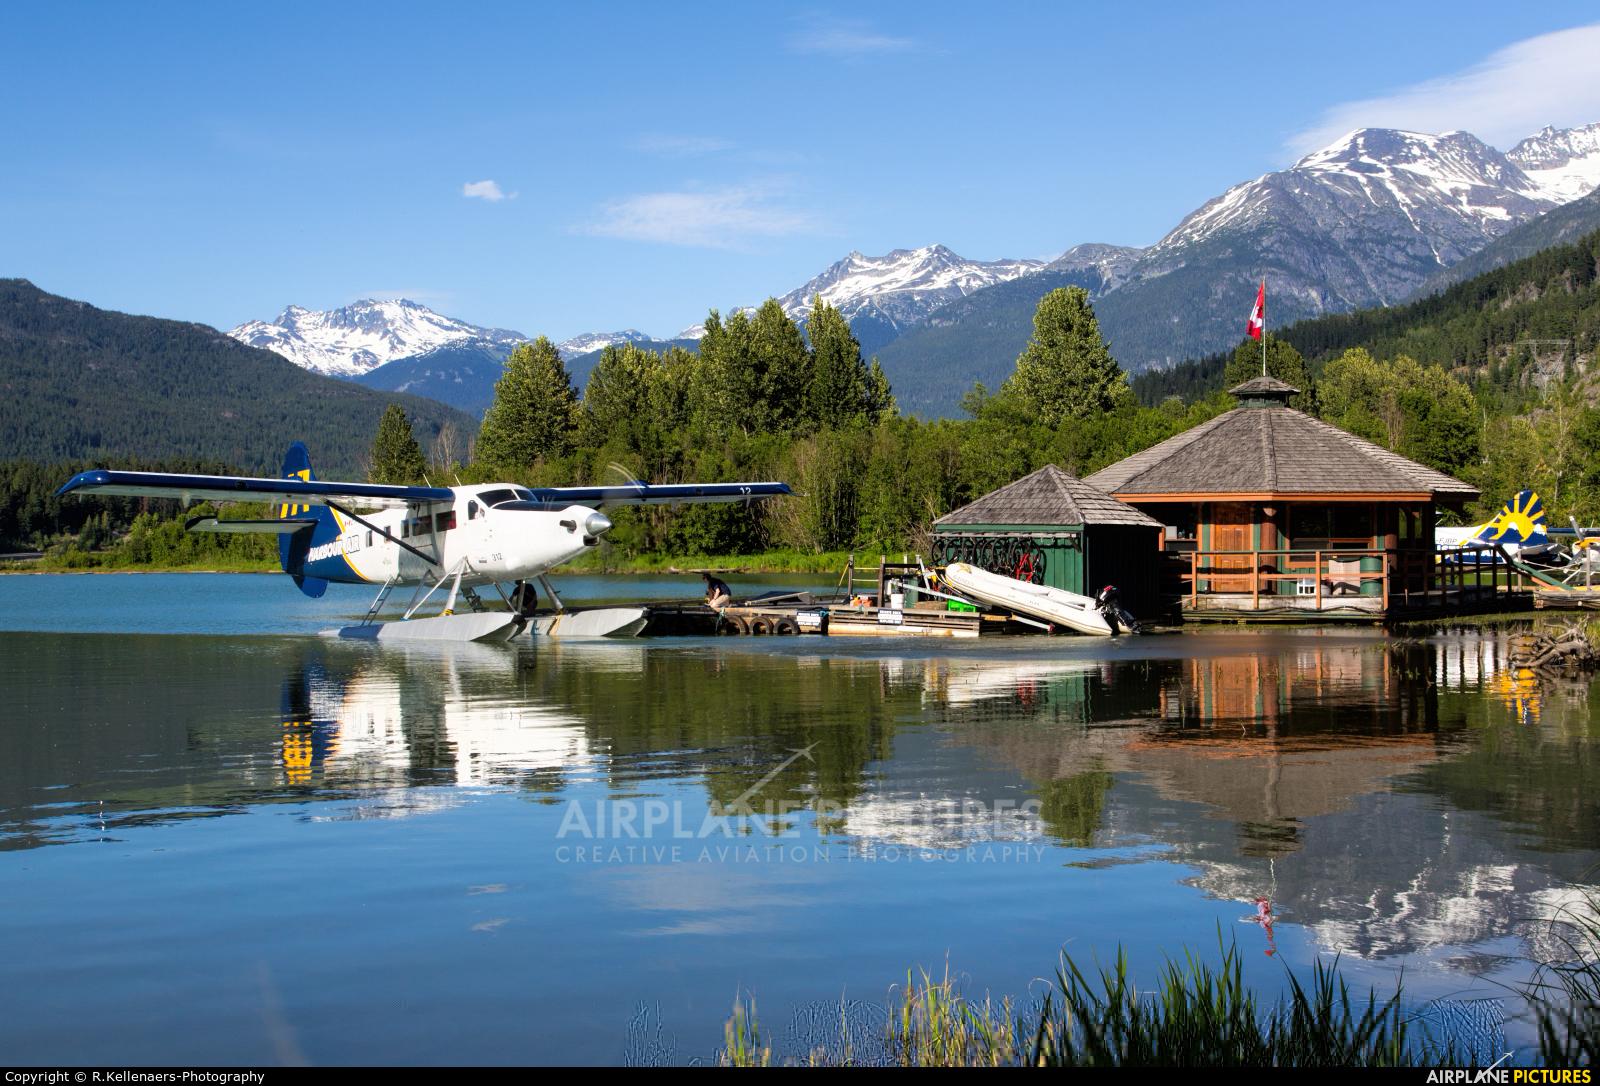 Harbour Air C-FHAS aircraft at Whistler - Green Lake Water, BC